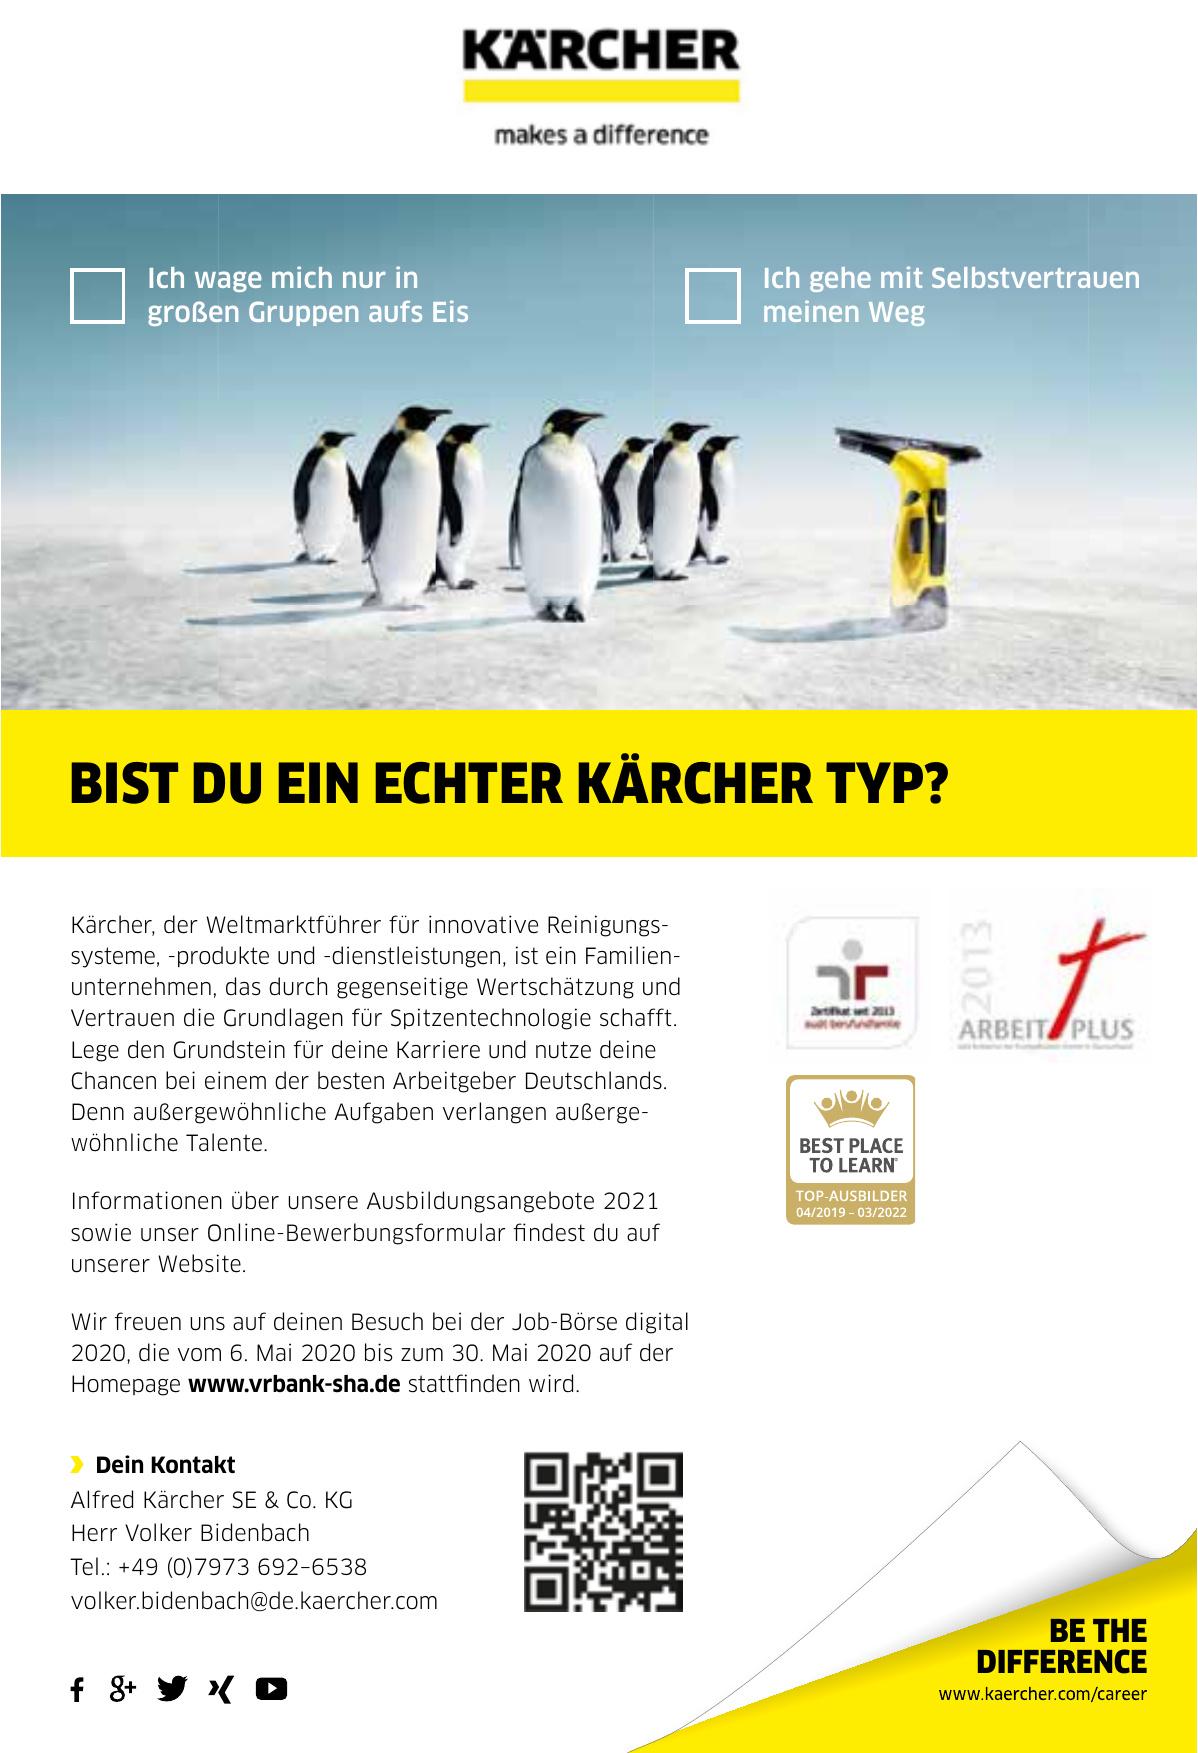 Alfred Kärcher SE & Co. KG